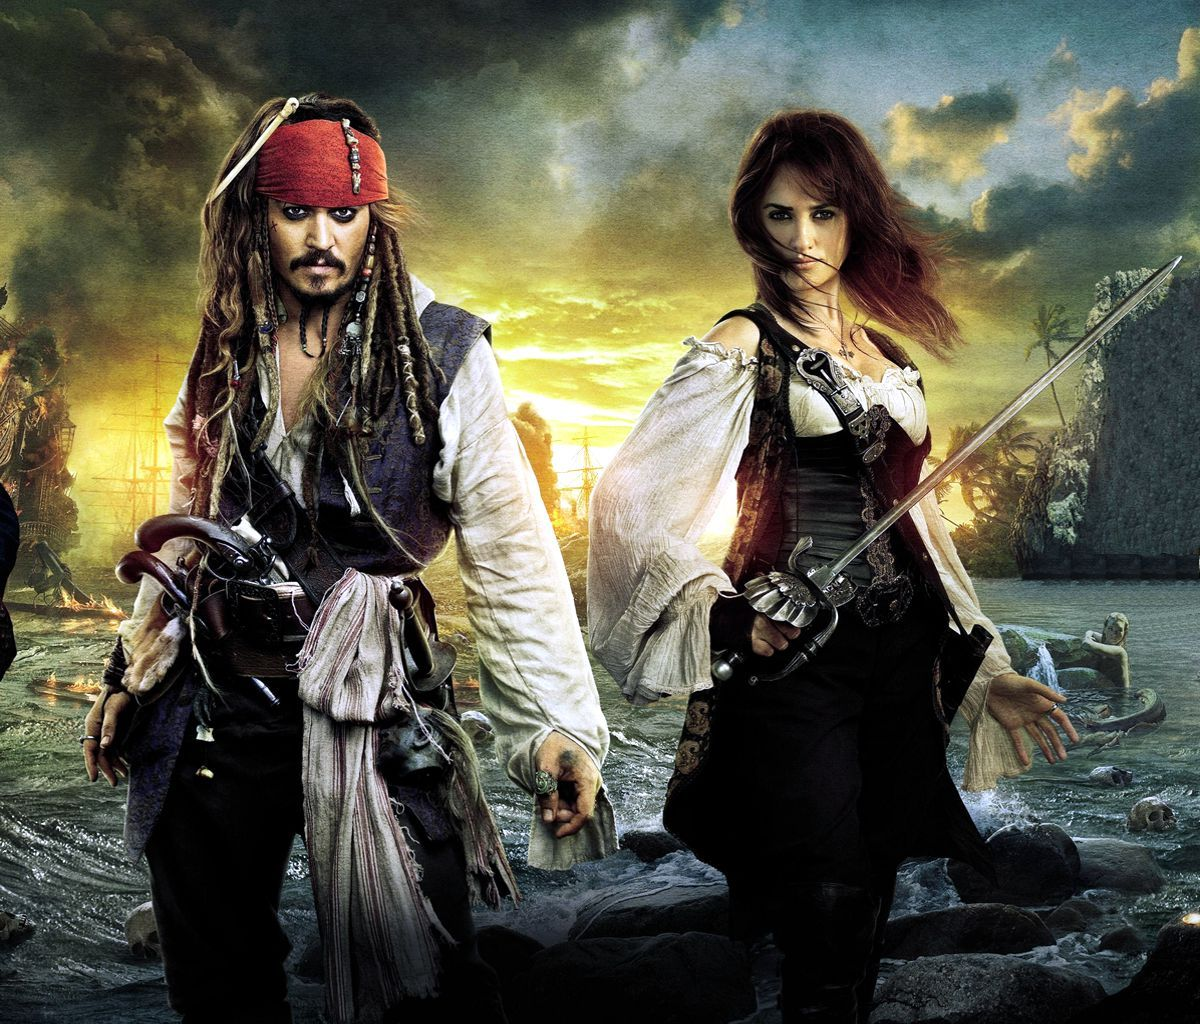 Penelope Cruz And Johnny Depp In Pirates Of Caribbean Stranger Tides Costume Ideas